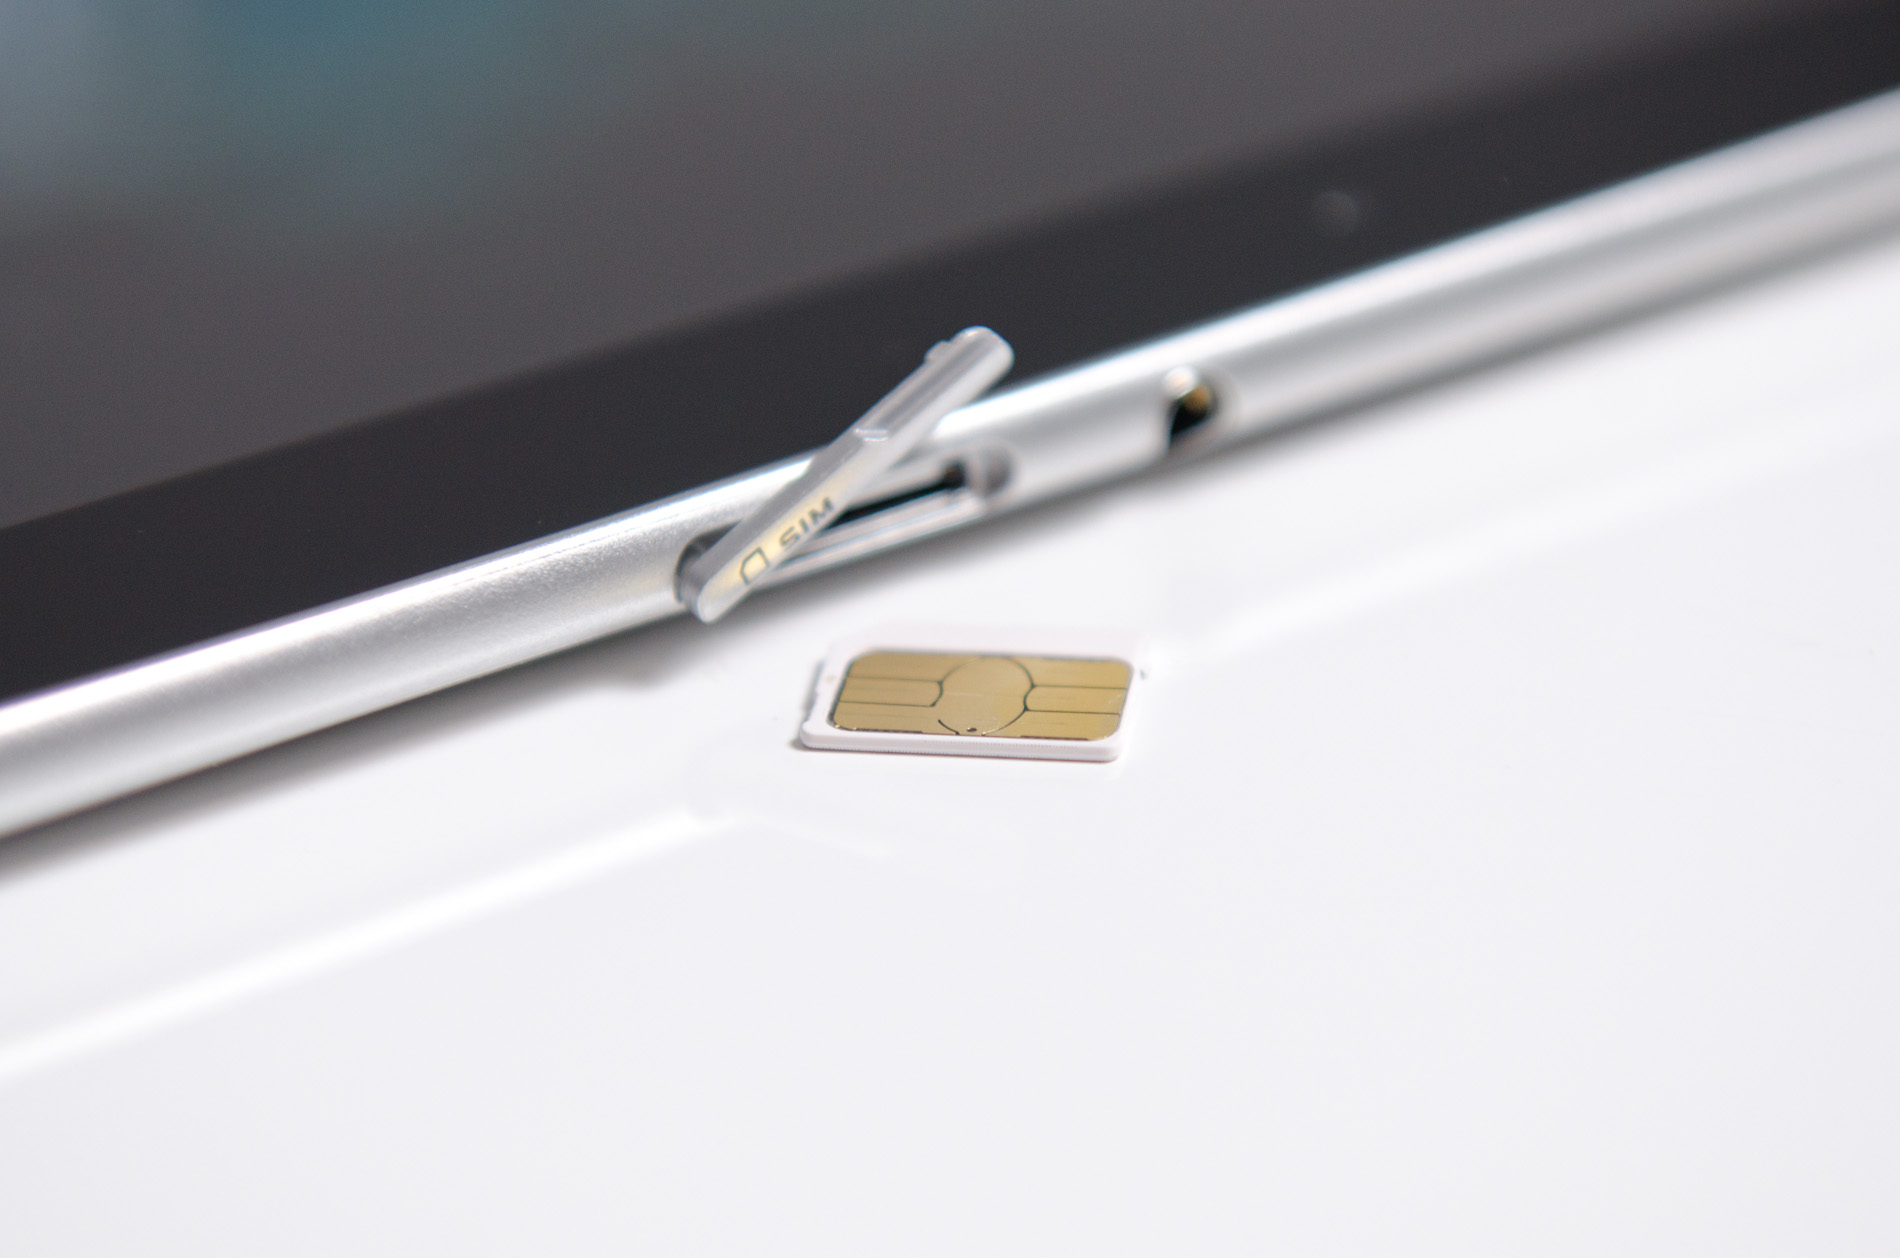 Samsung Galaxy Tab 10.1 4G LTE Review